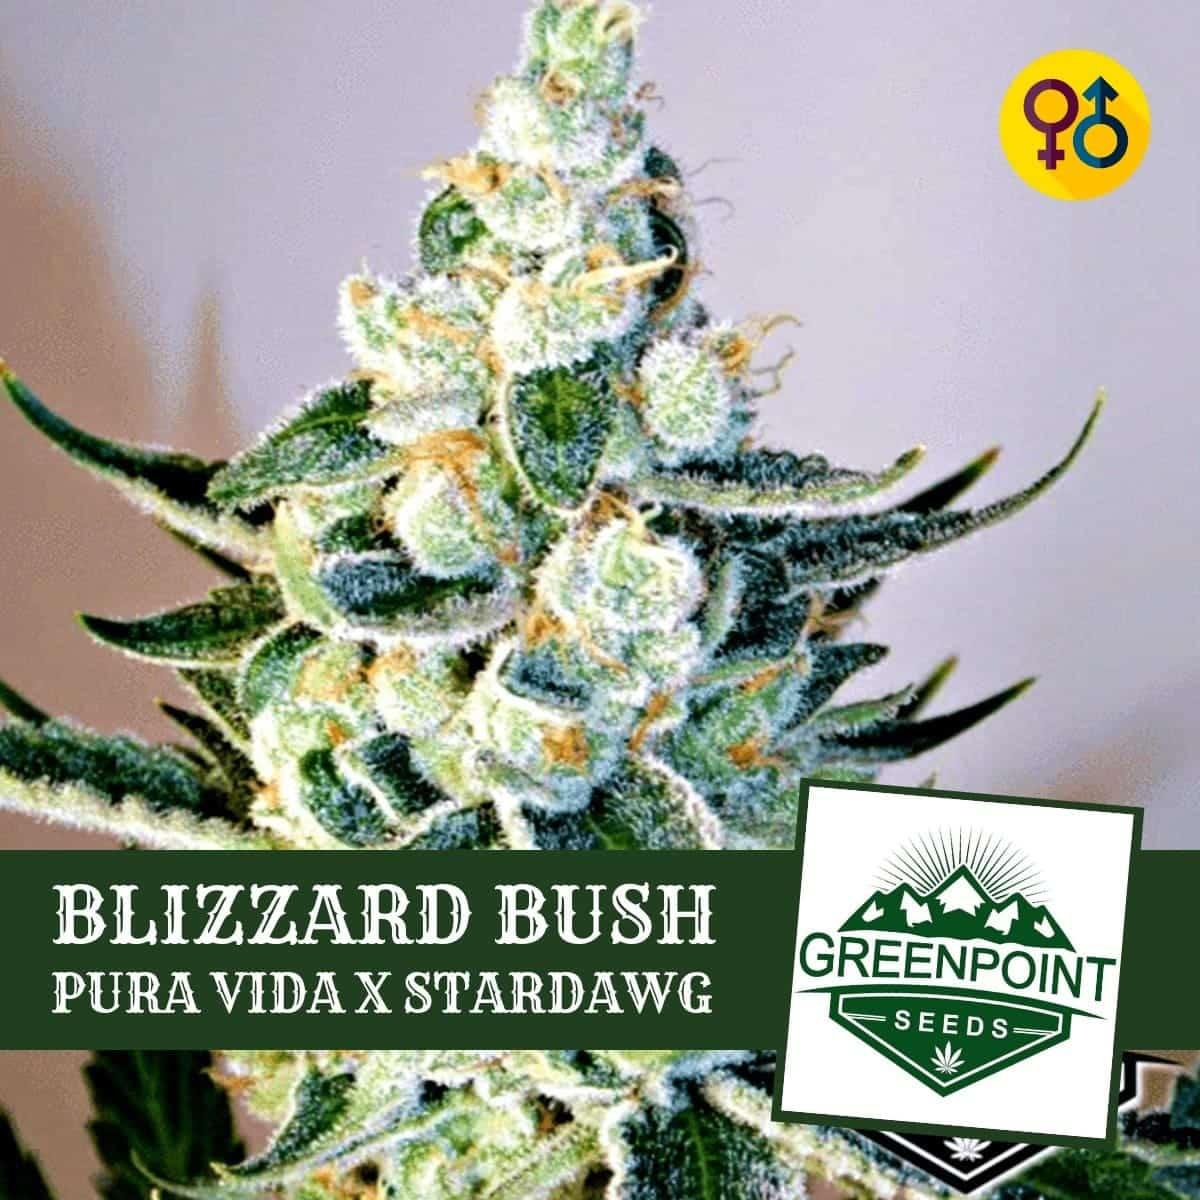 Blizzard Bush - Pura Vida X Star Dawg Cannabis Seeds | Greenpoint Seeds